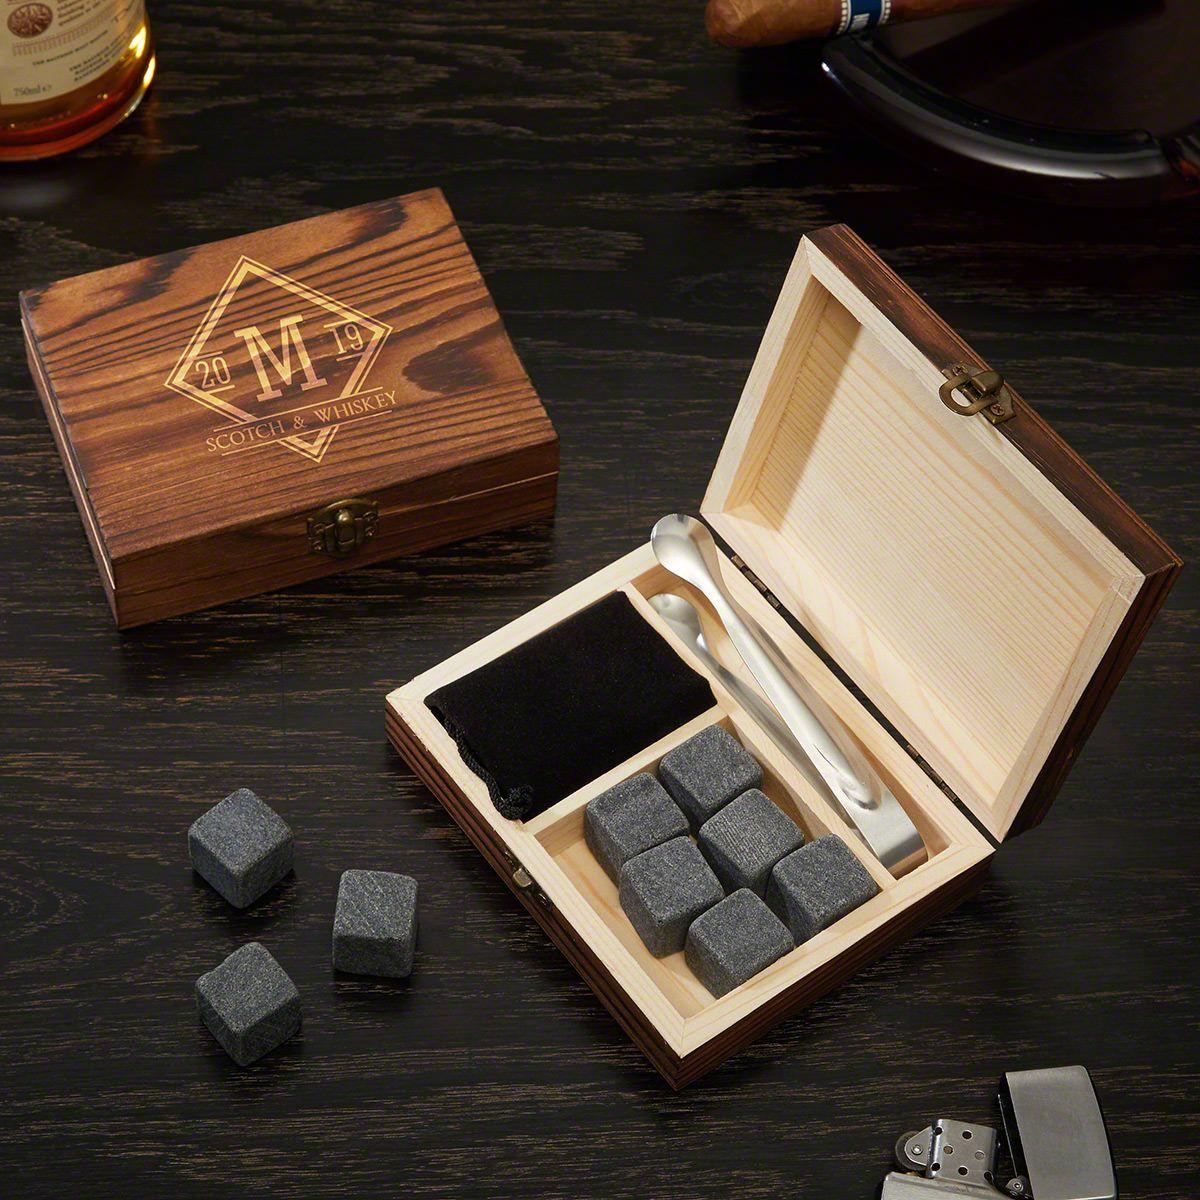 Drake Etched Whiskey Stones Gift Set